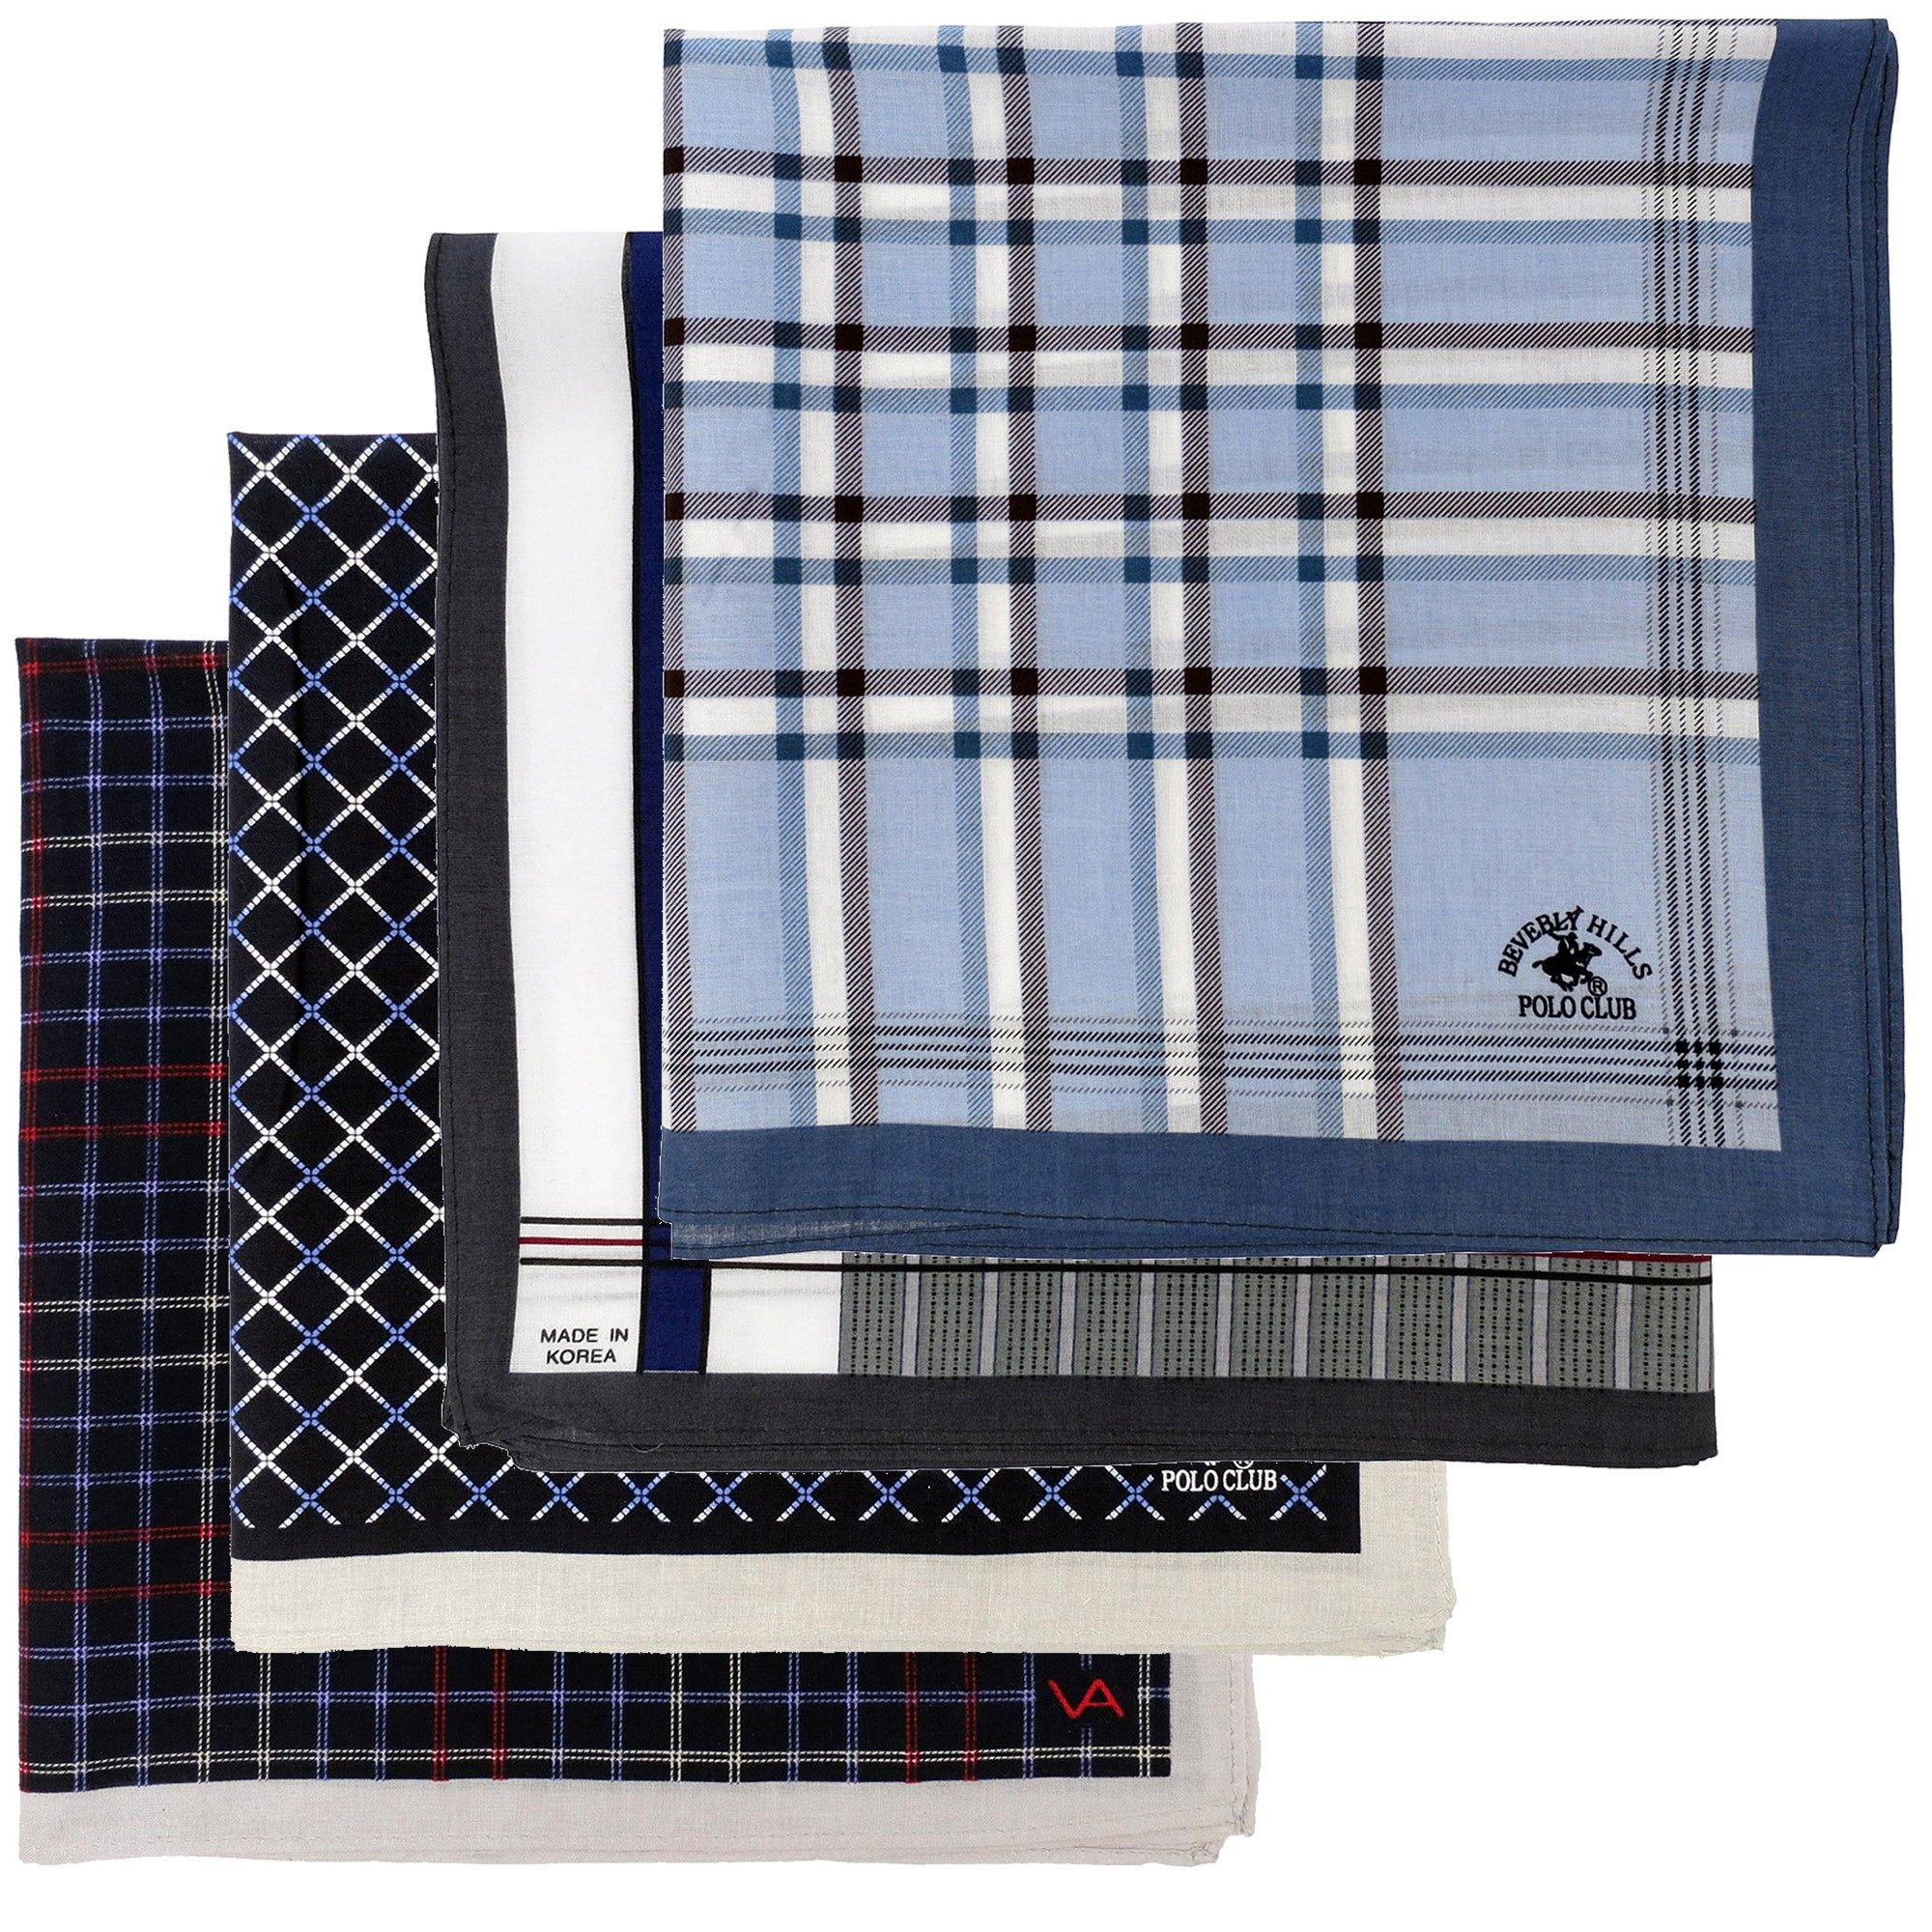 Leevo Handkerchief Men Assorted Woven Cotton 100% Hankies Fashion 4pack OPP Set Assorted (17.5inch No.5~8 Assorted 4pack OPP set)